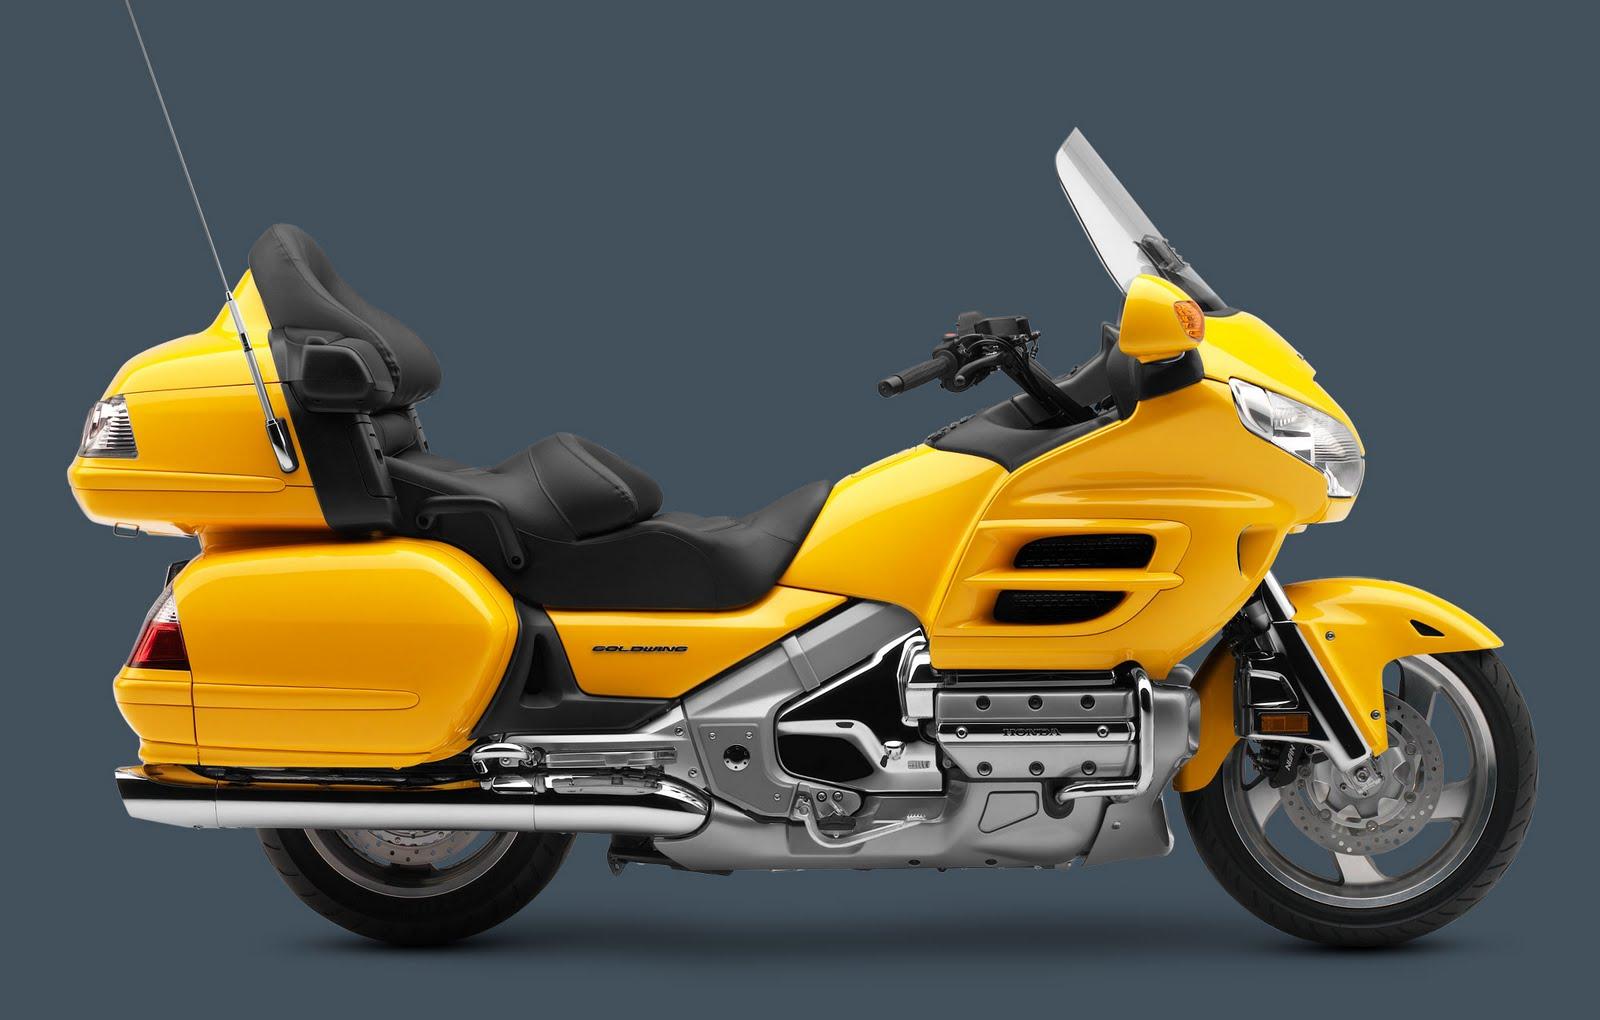 top motorcycle inc 2012 honda goldwing. Black Bedroom Furniture Sets. Home Design Ideas